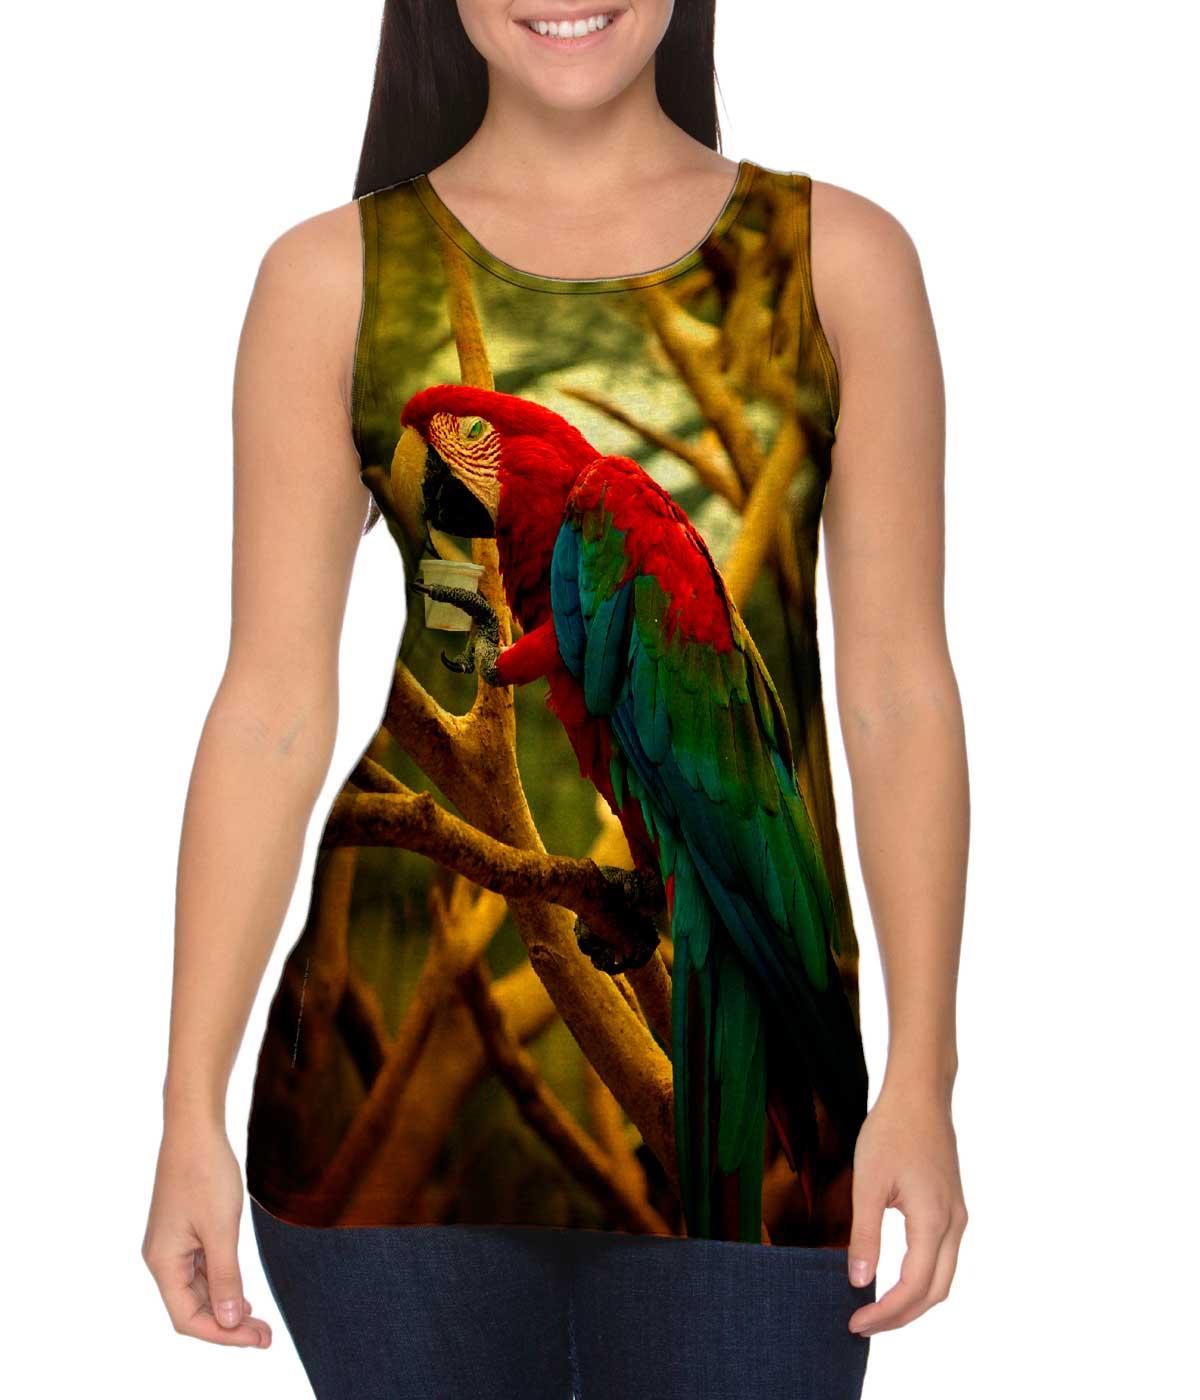 Yizzam-Cafe-Macaw-New-Ladies-Women-Tank-XS-S-M-L-XL-2XL-3XL-4XL